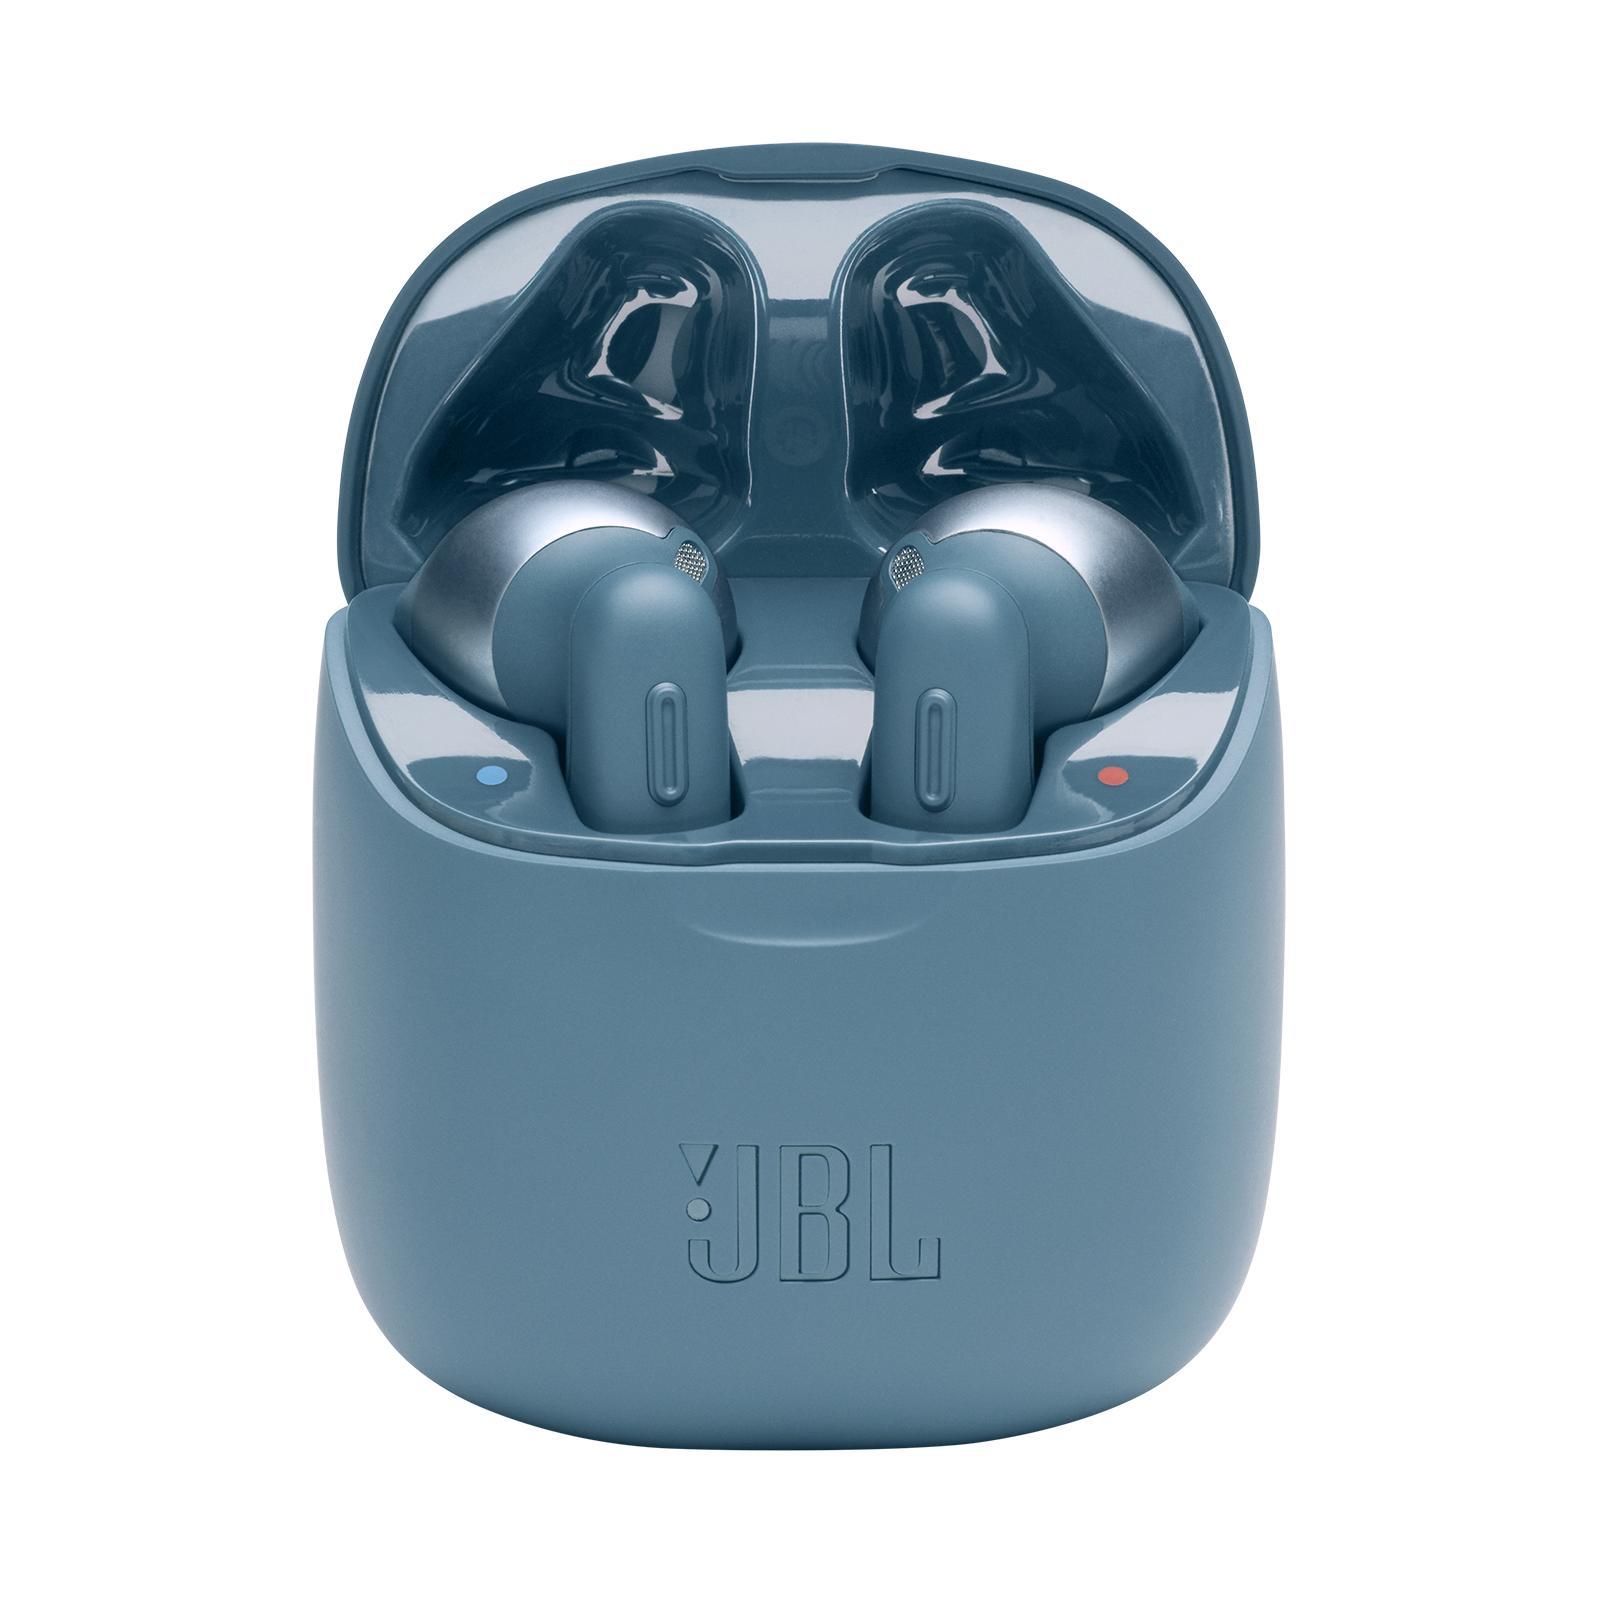 JBL headphones 220TWS review